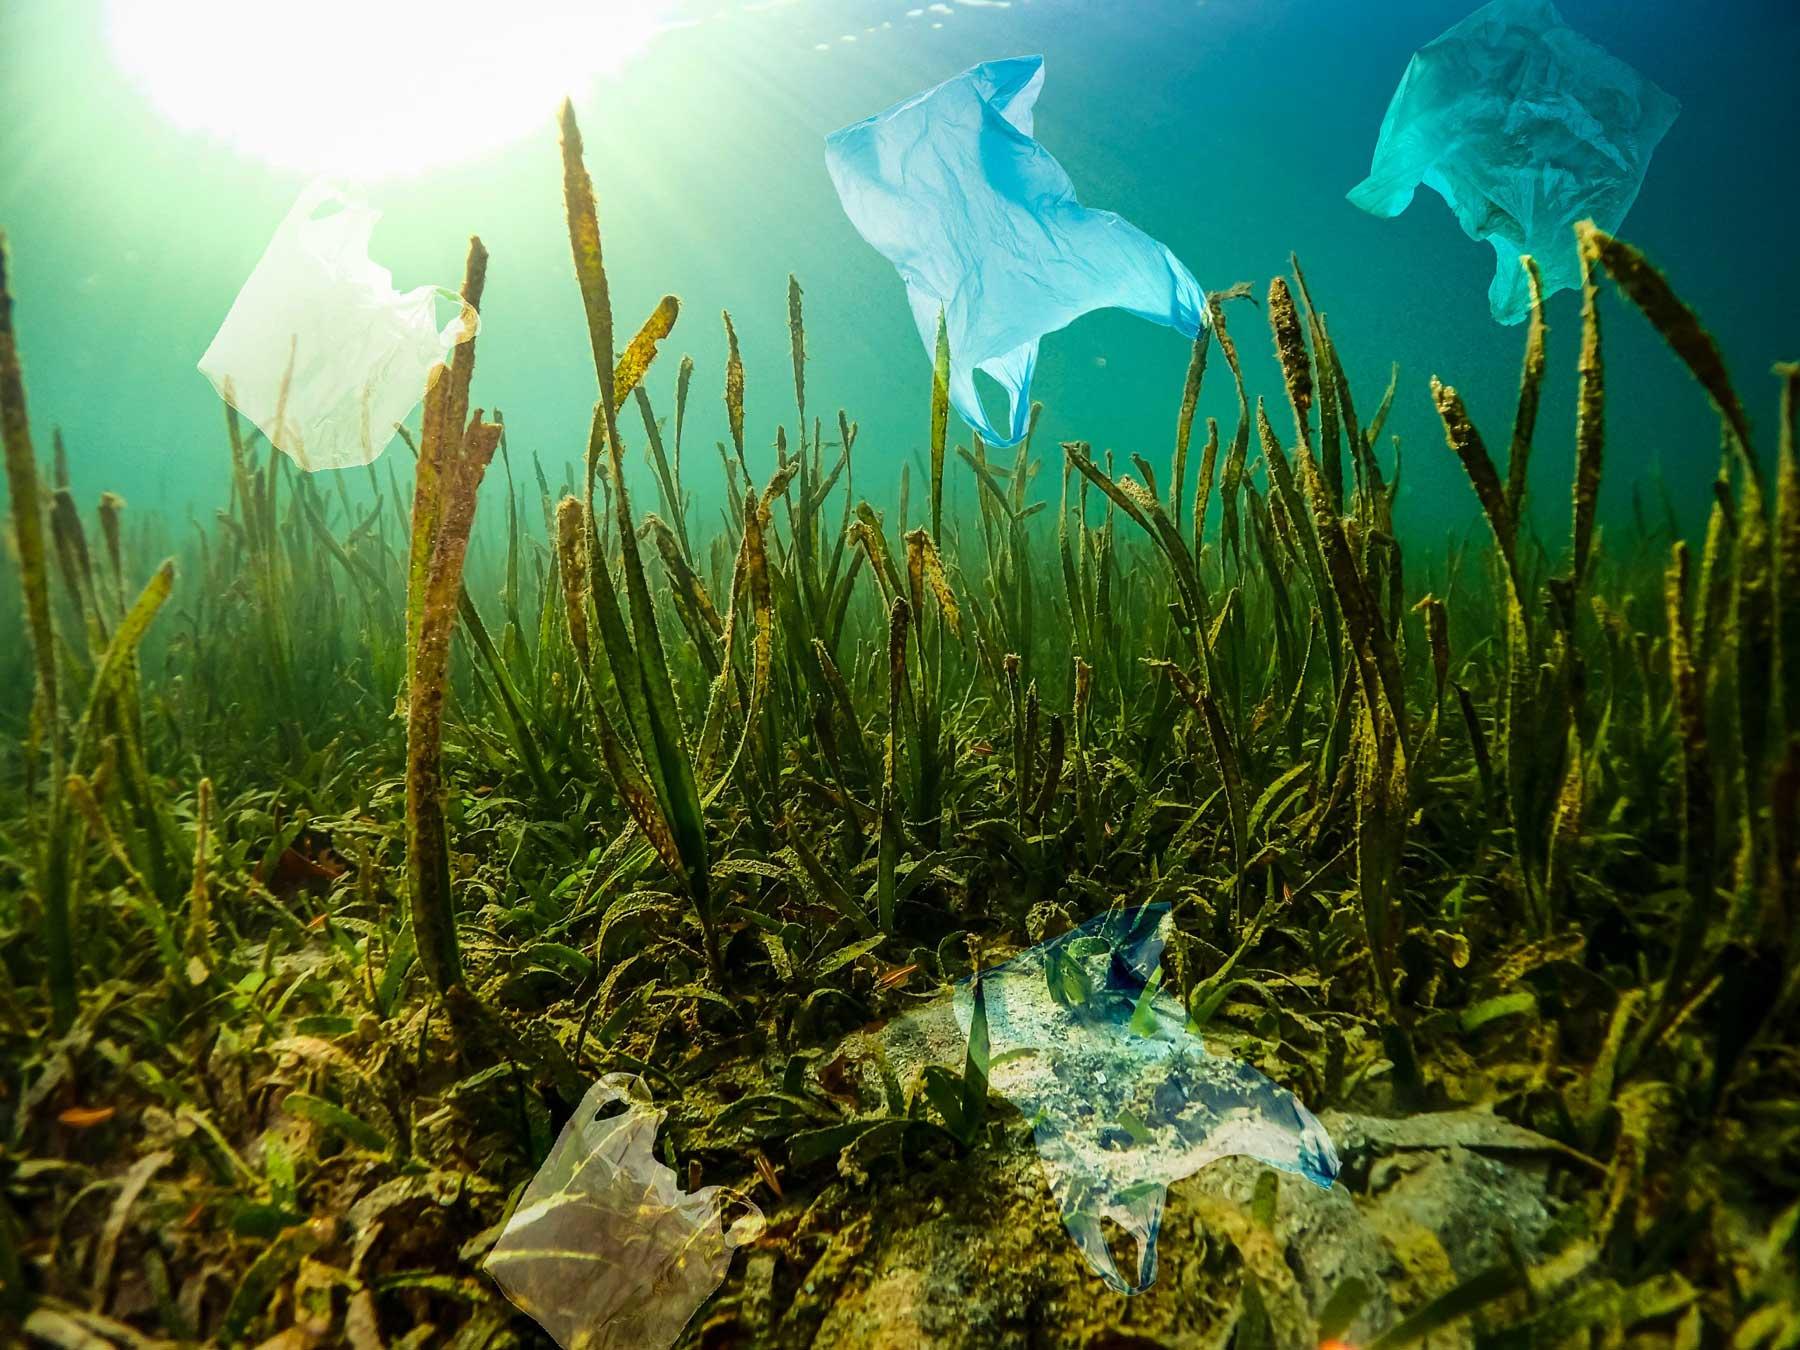 Plastic bags stuck on water plants